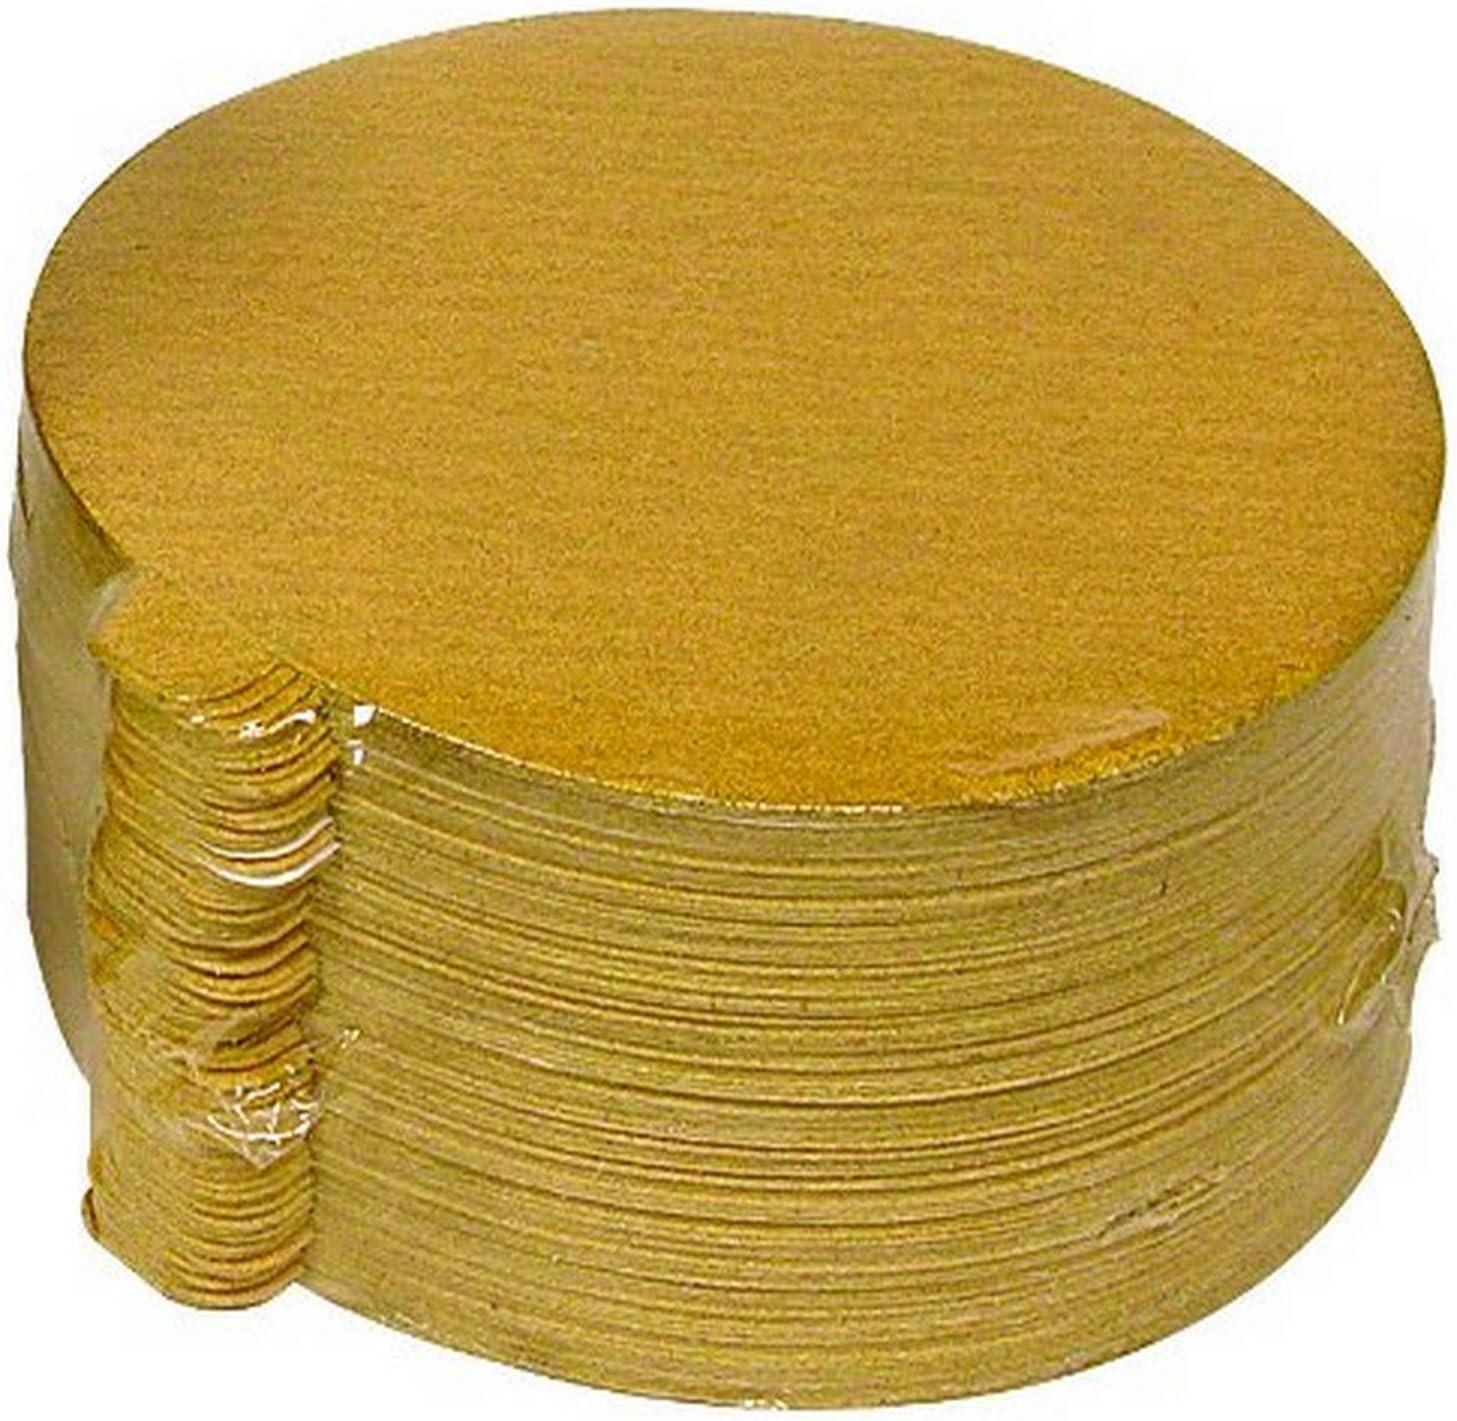 100-Pack 120-Grit Shark 236120 6-Inch PSA Super Gold Discs